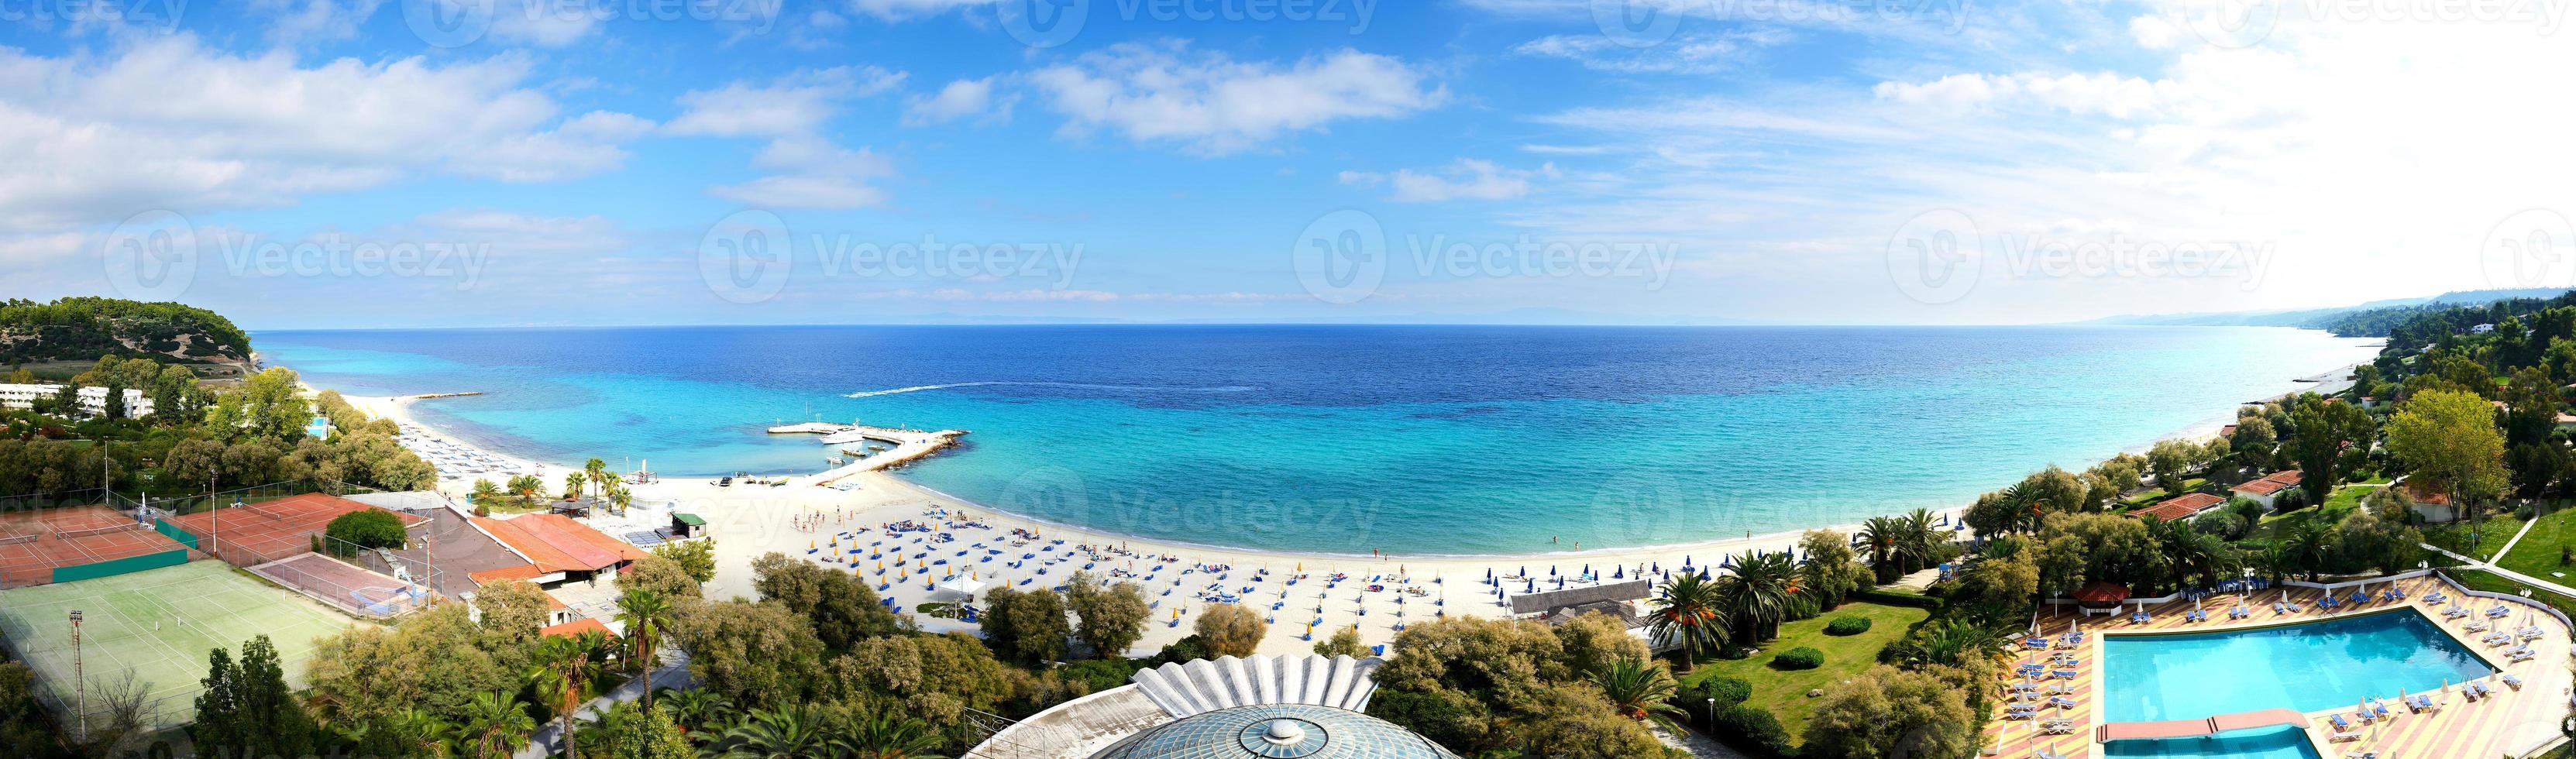 vista panorâmica na praia em hotel de luxo moderno foto